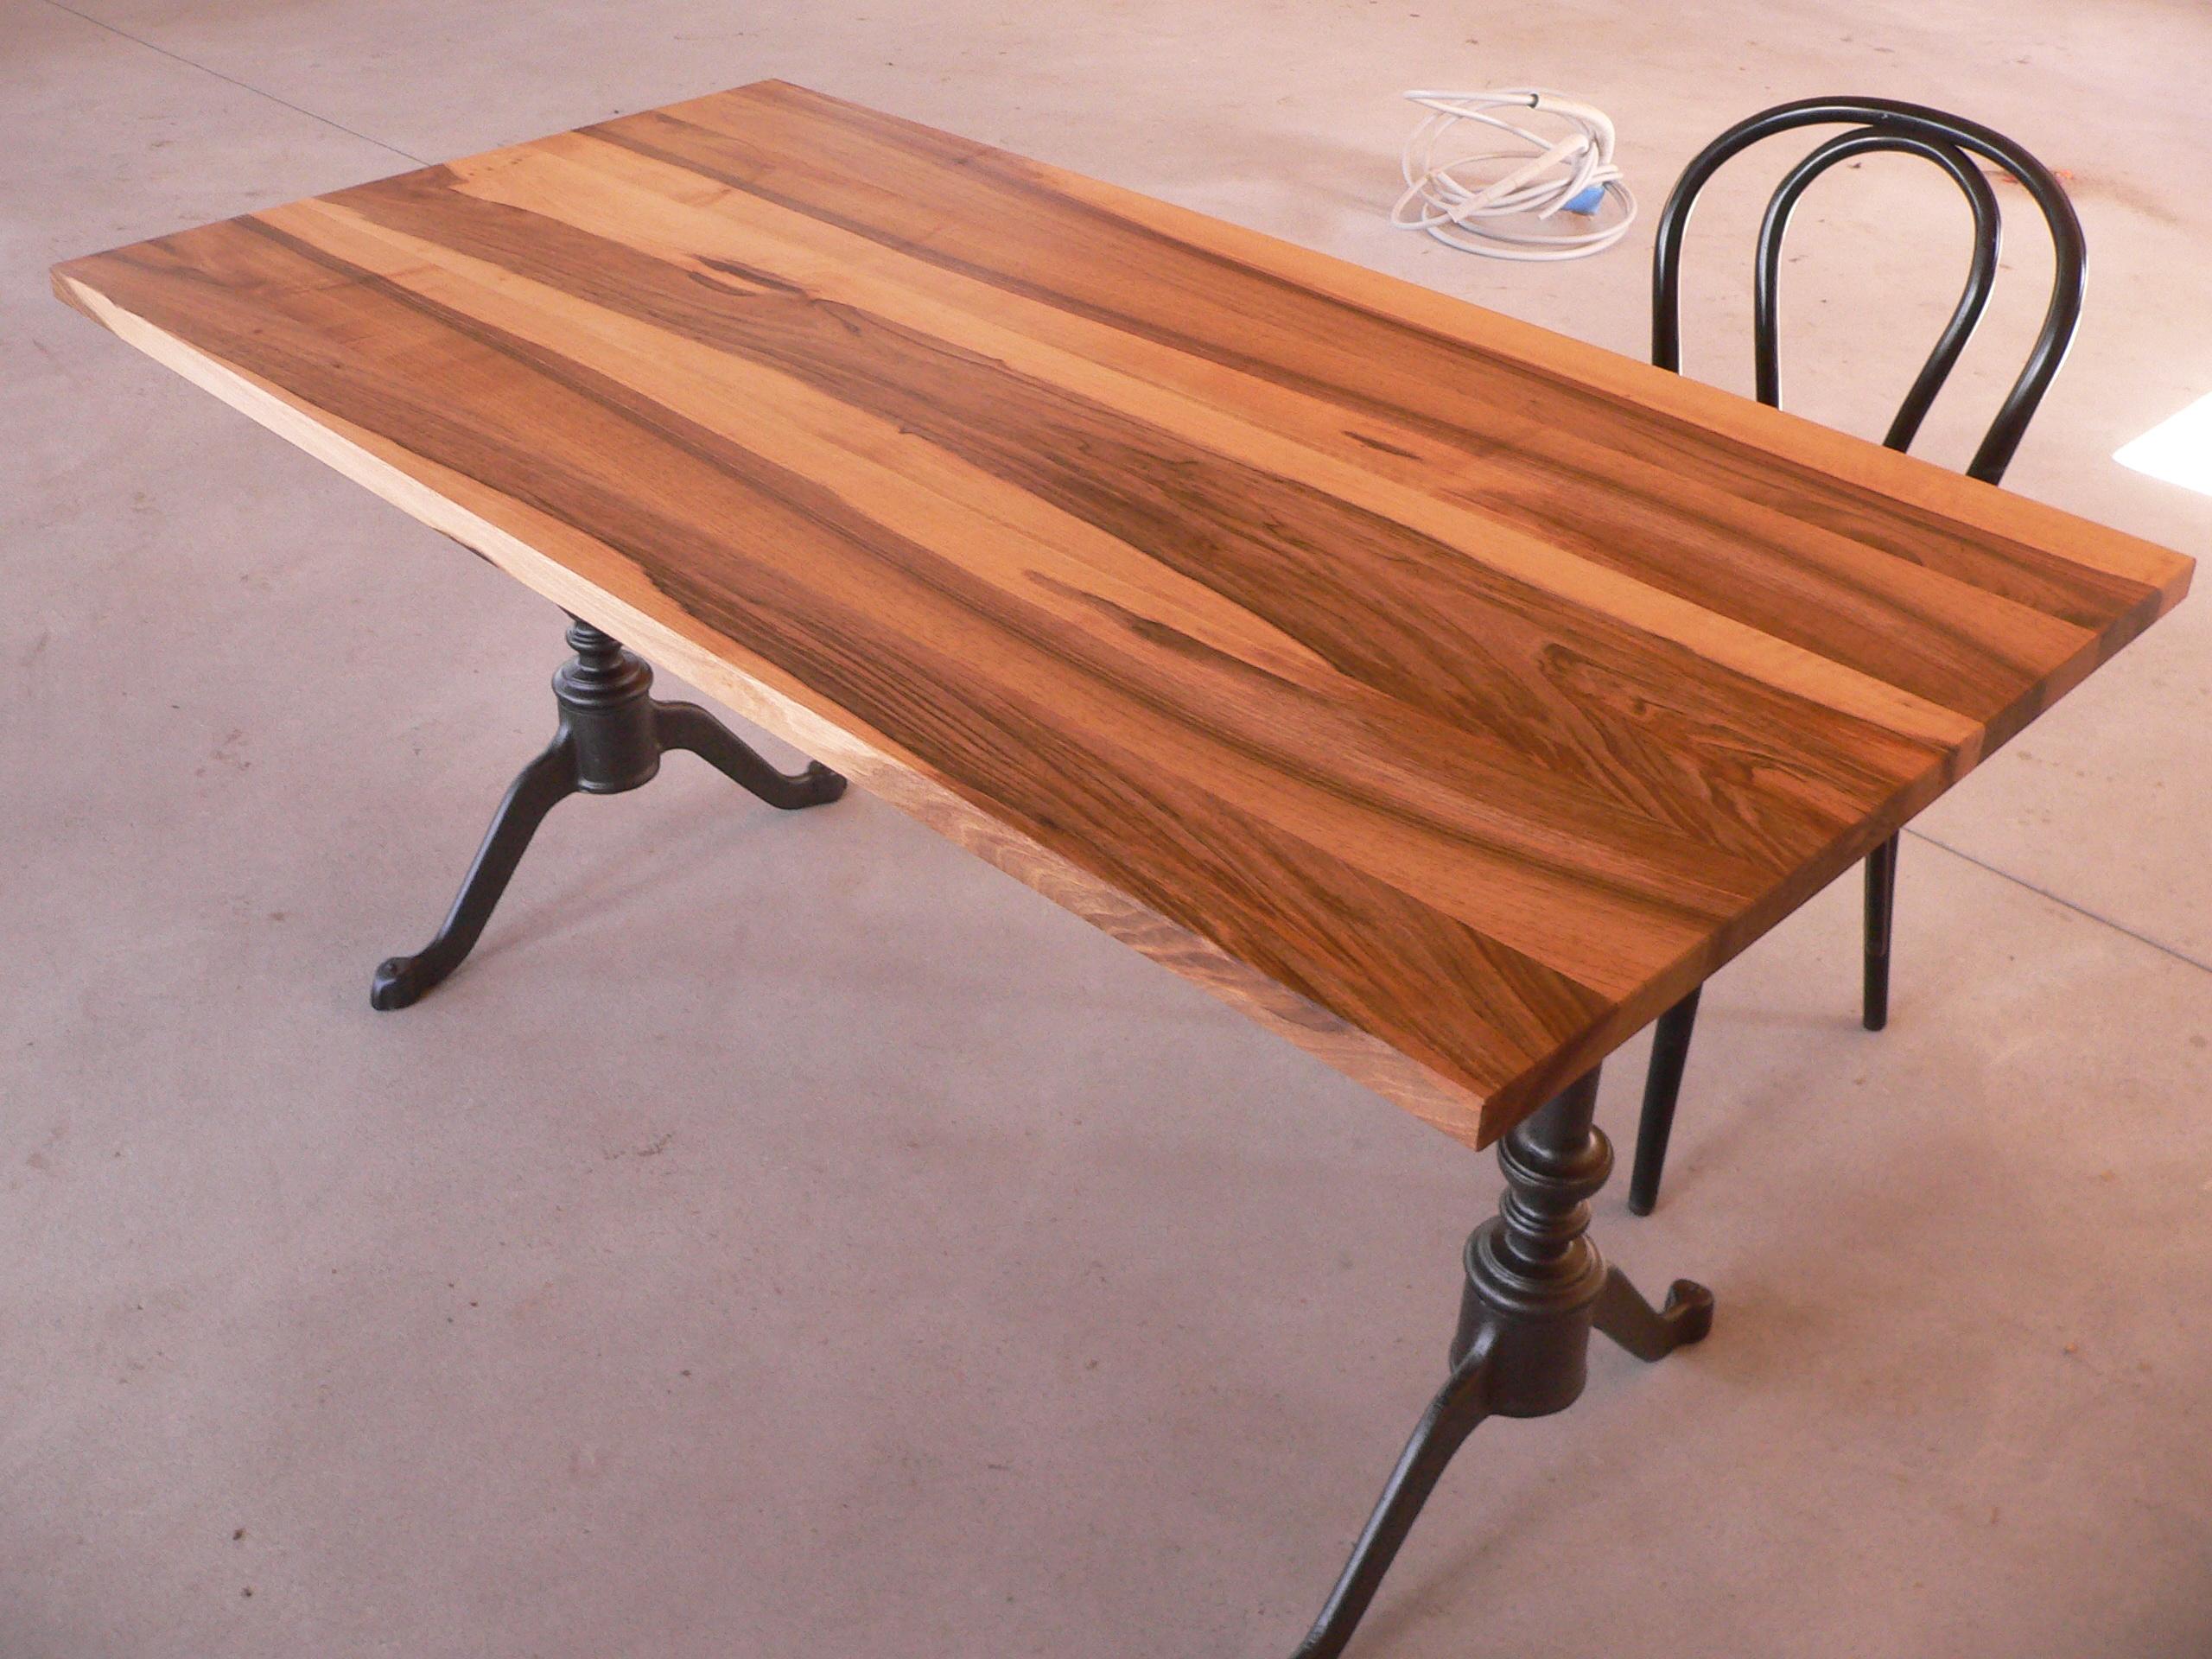 Möbel-Manufaktur – Drechslerei Lehmann